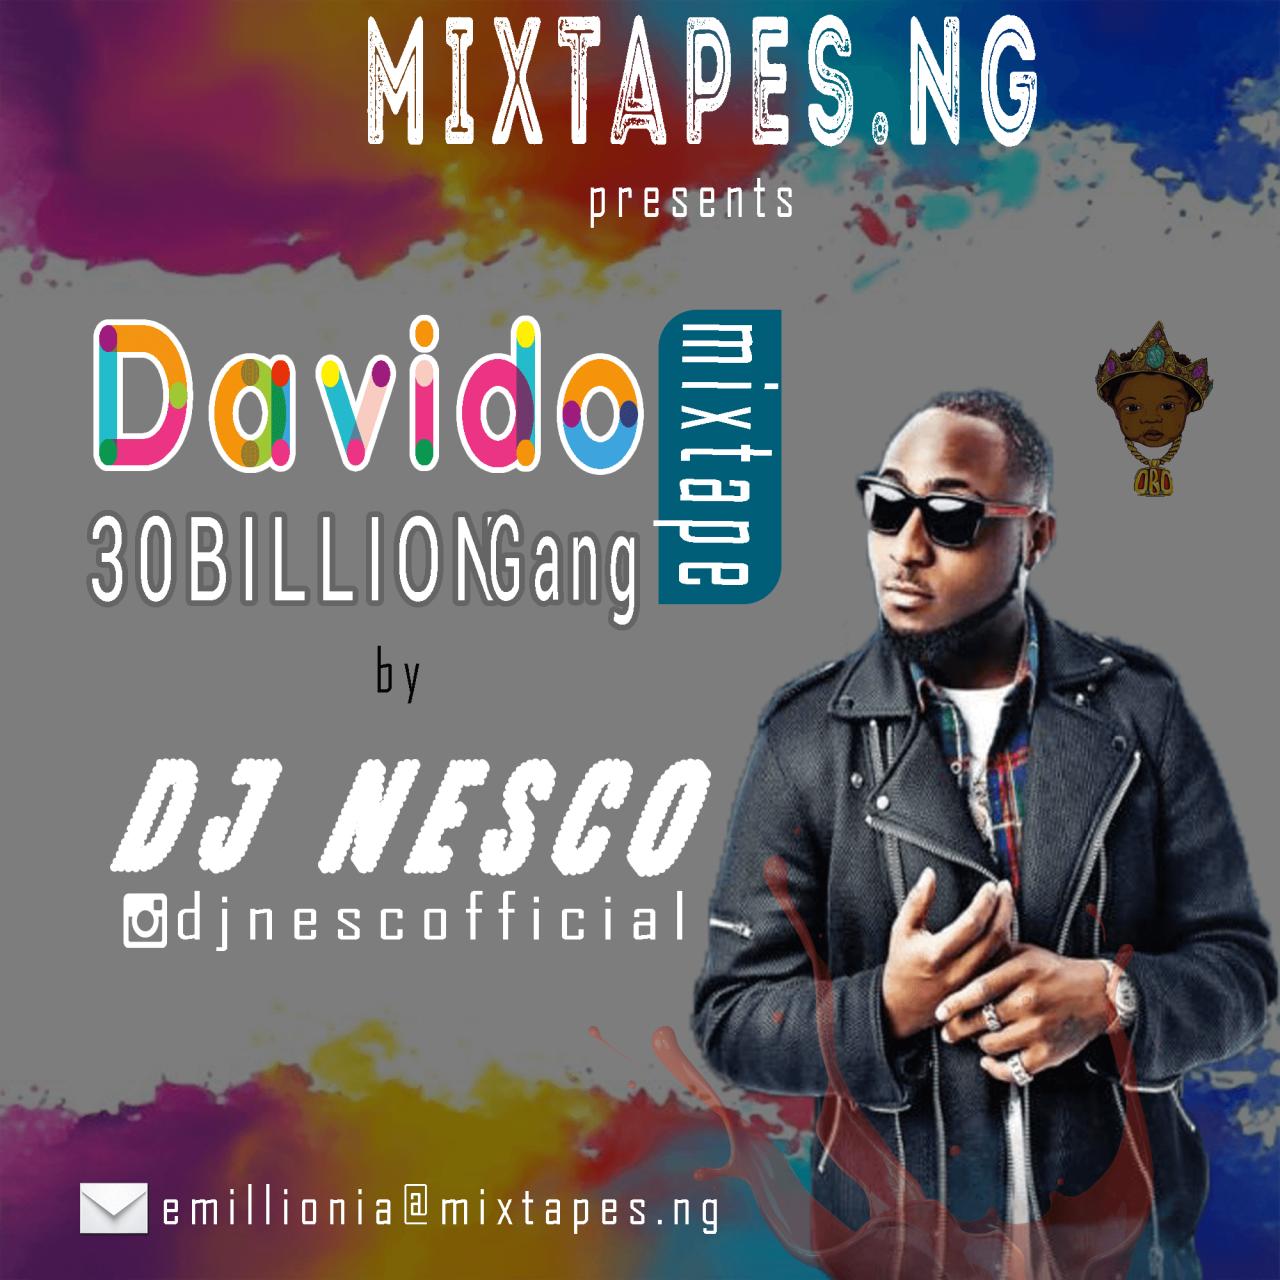 [Latest] Best Of Davido (2018) 30 Billion Gang Mixtape By Dj Nesco - 149.28 Mb